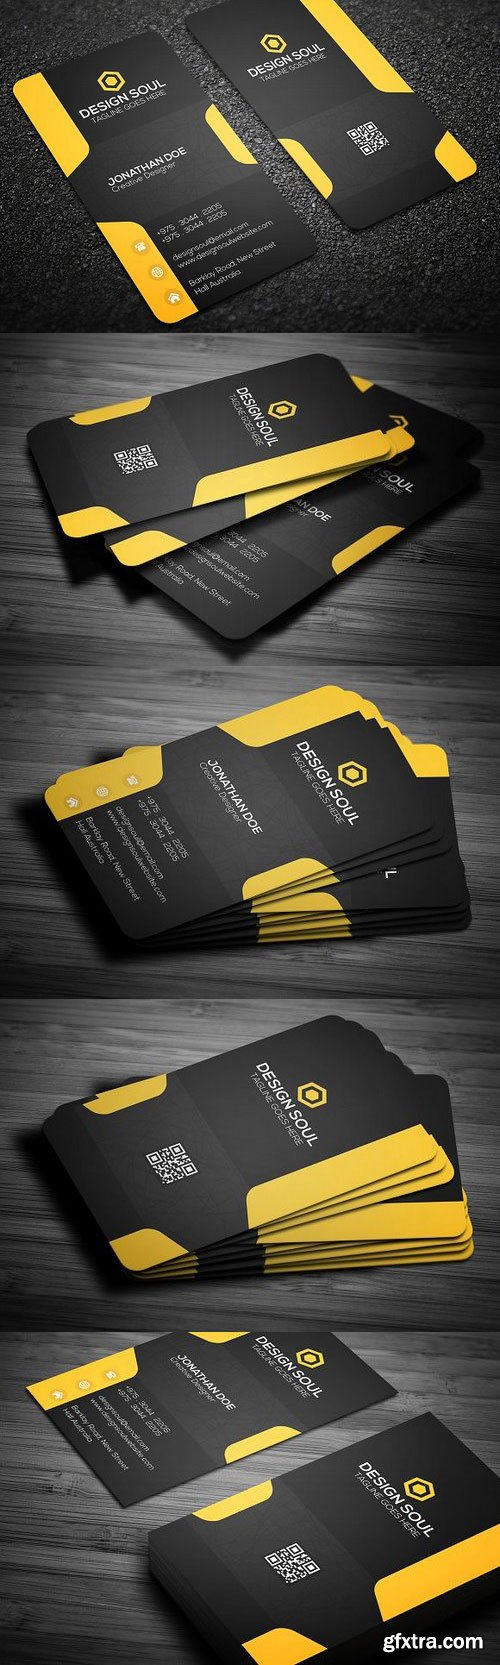 CM 698633 - Creative Business Card